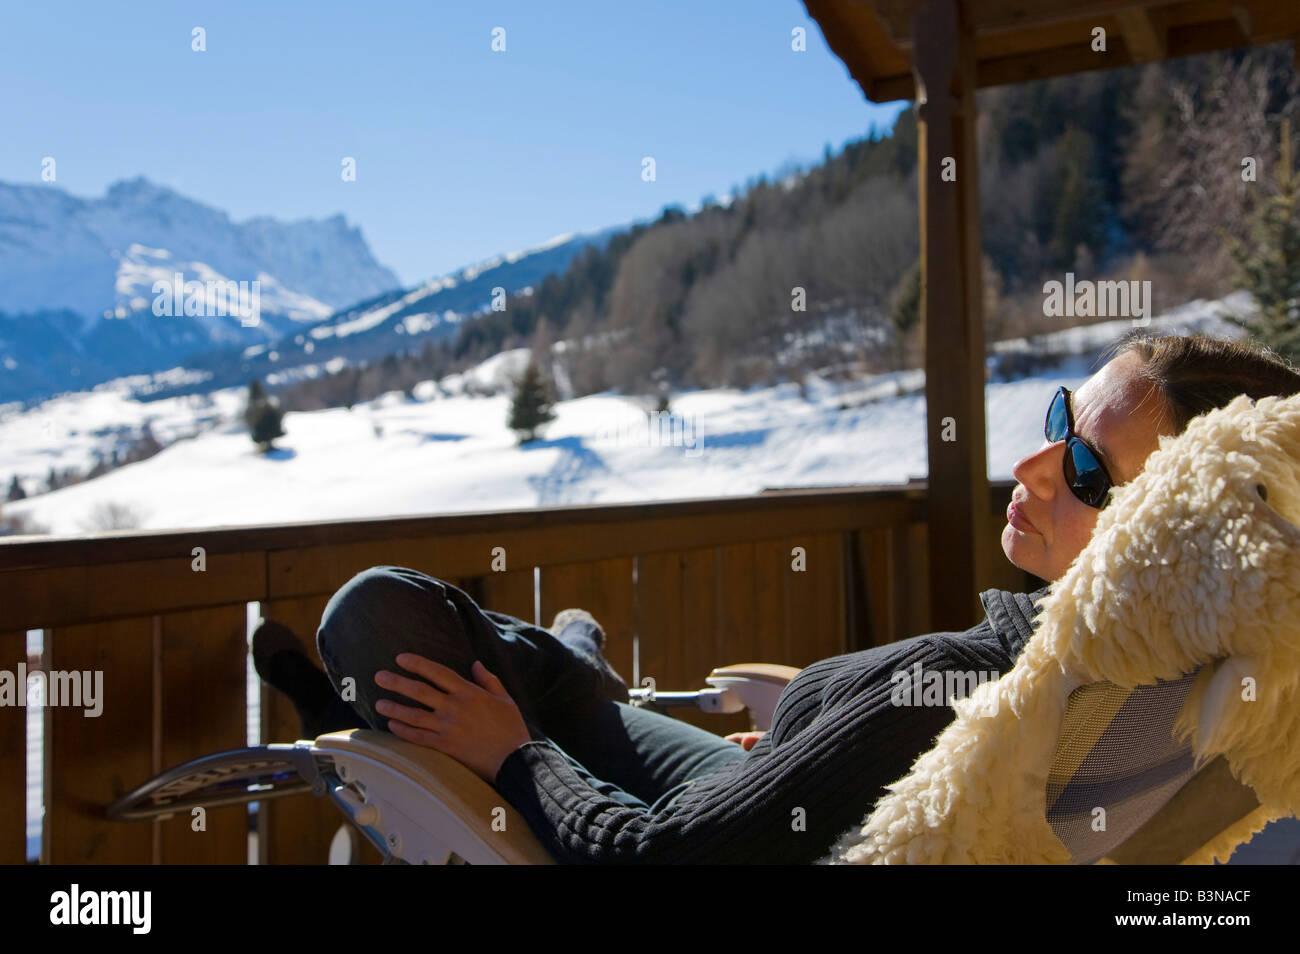 Switzerland, Graubuenden, Savognin, woman relaxing on sun terrace - Stock Image